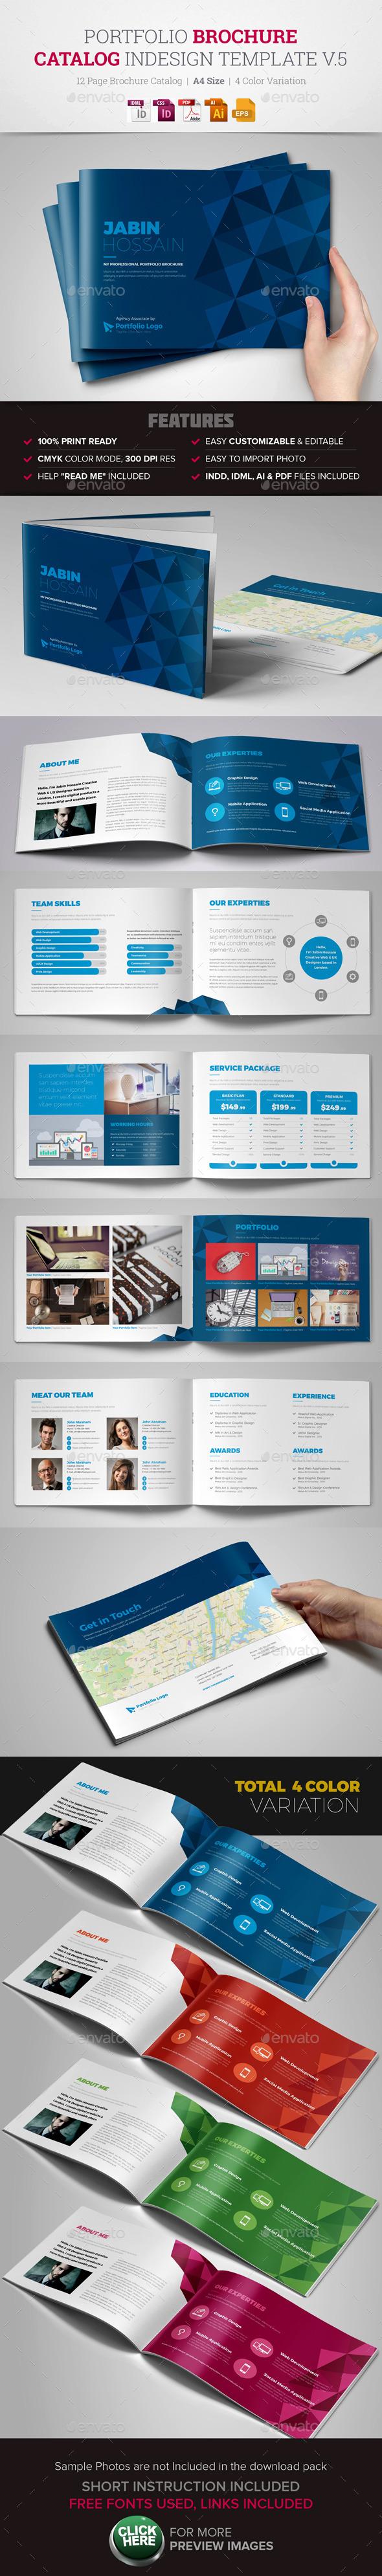 Portfolio Brochure InDesign Template v5  - Corporate Brochures